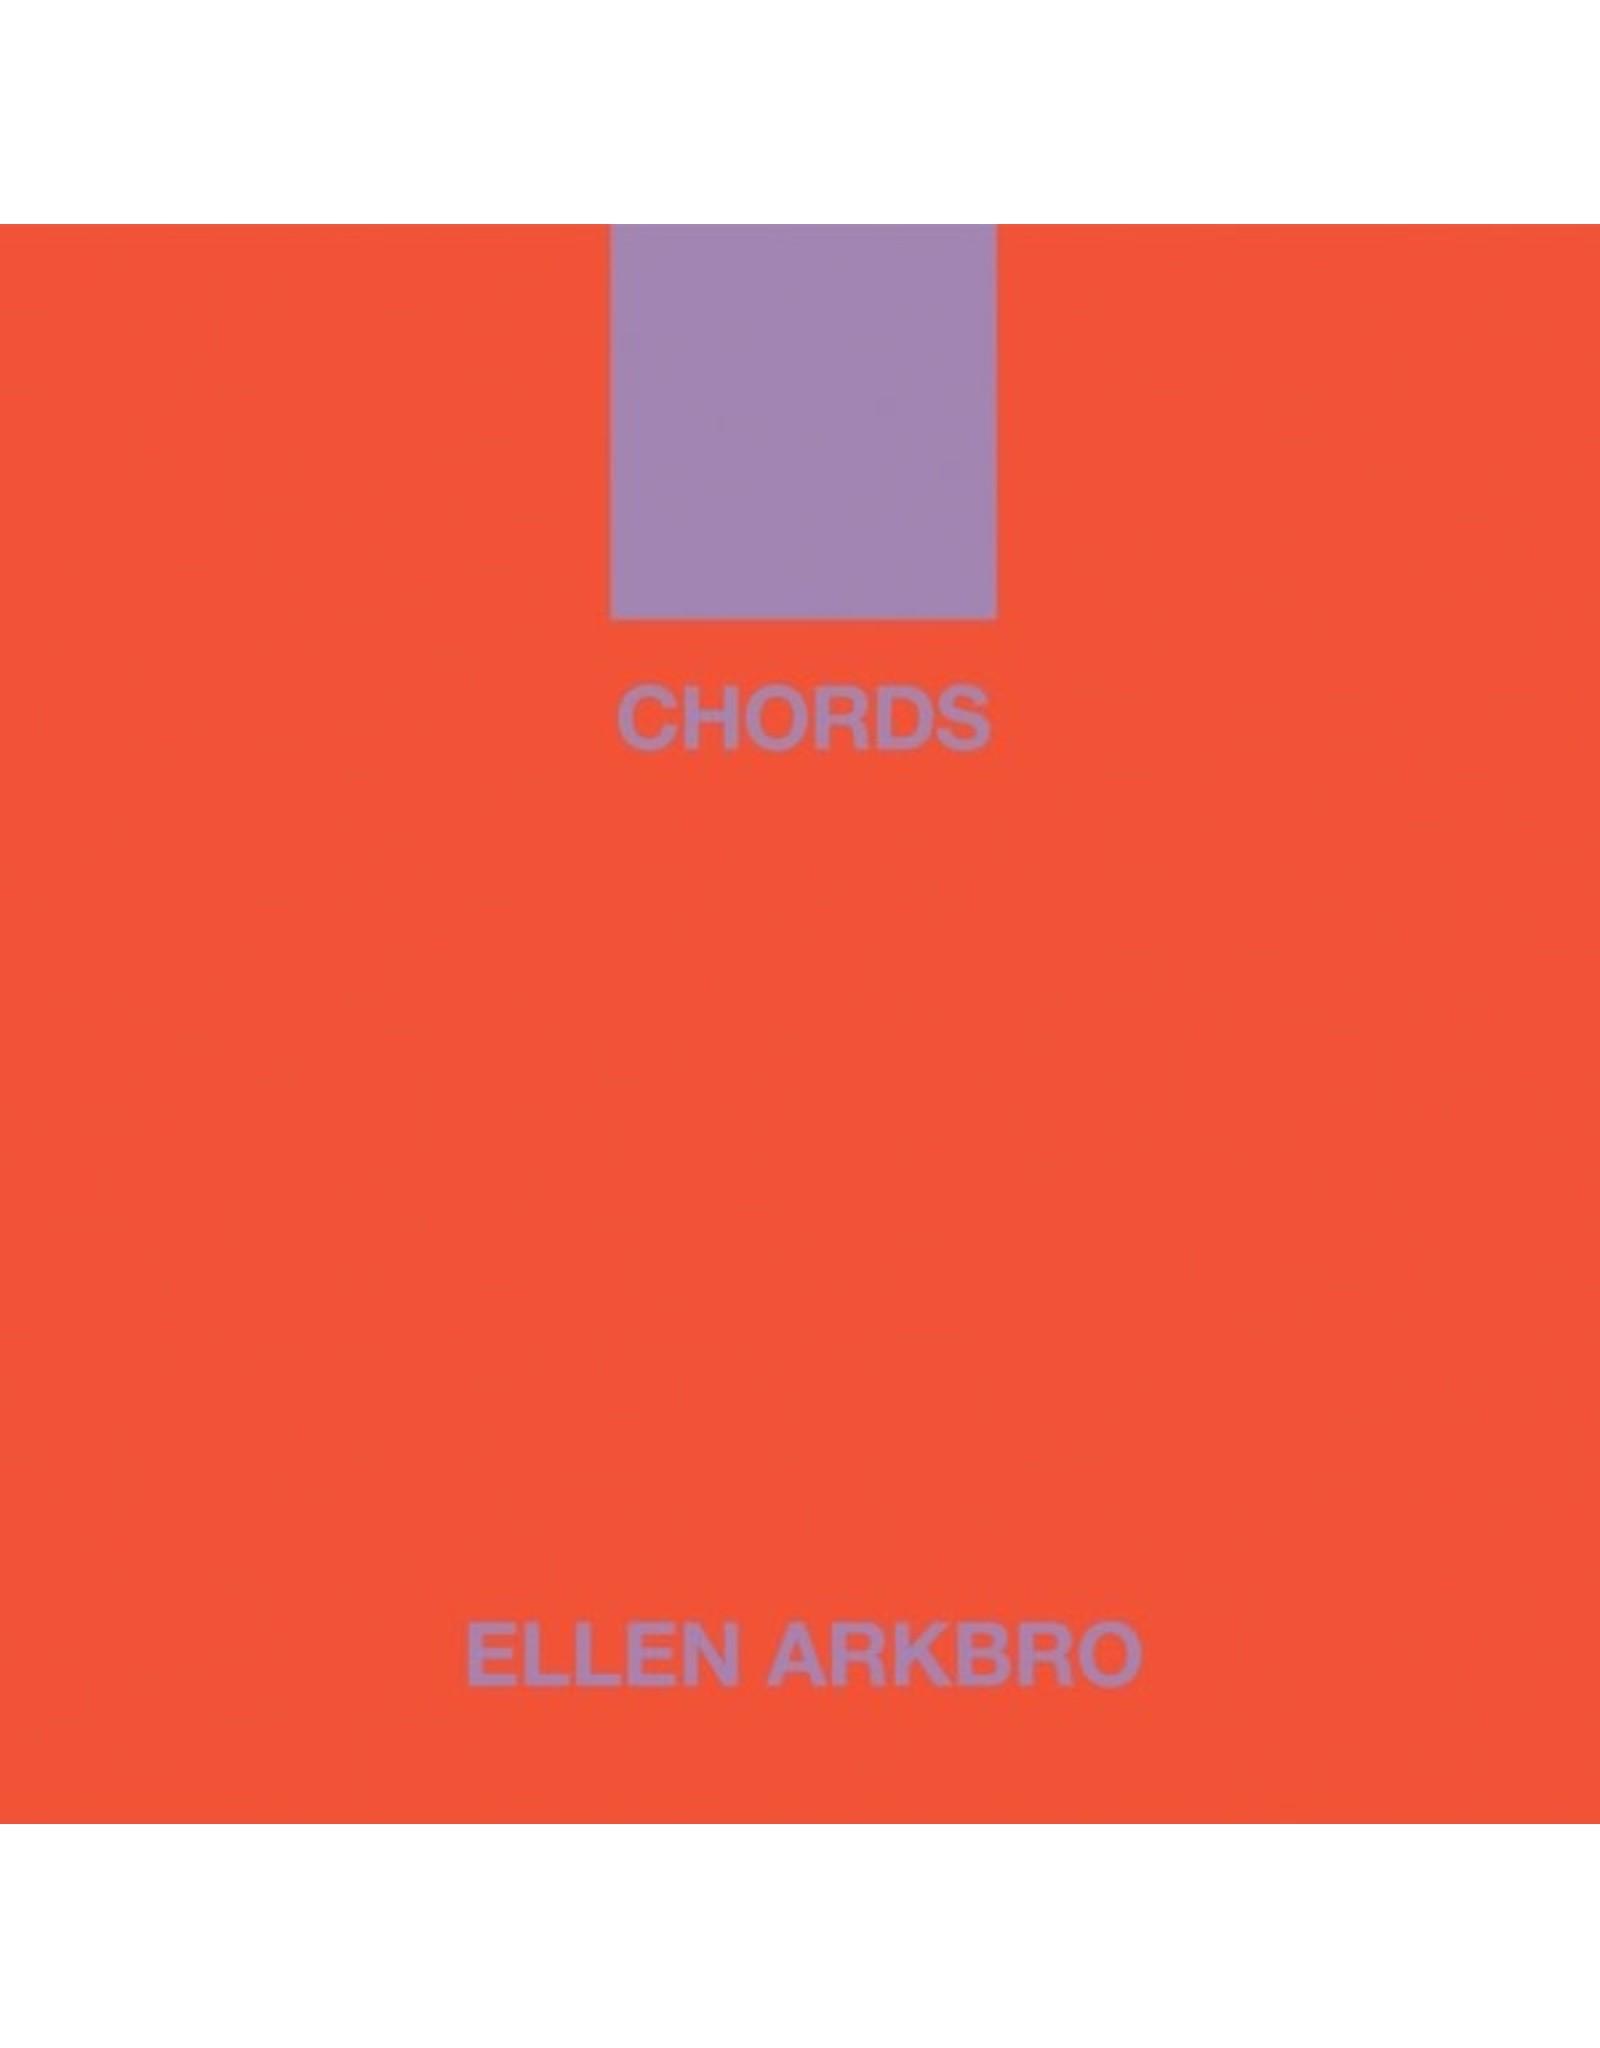 Arkbro, Ellen: Chords LP